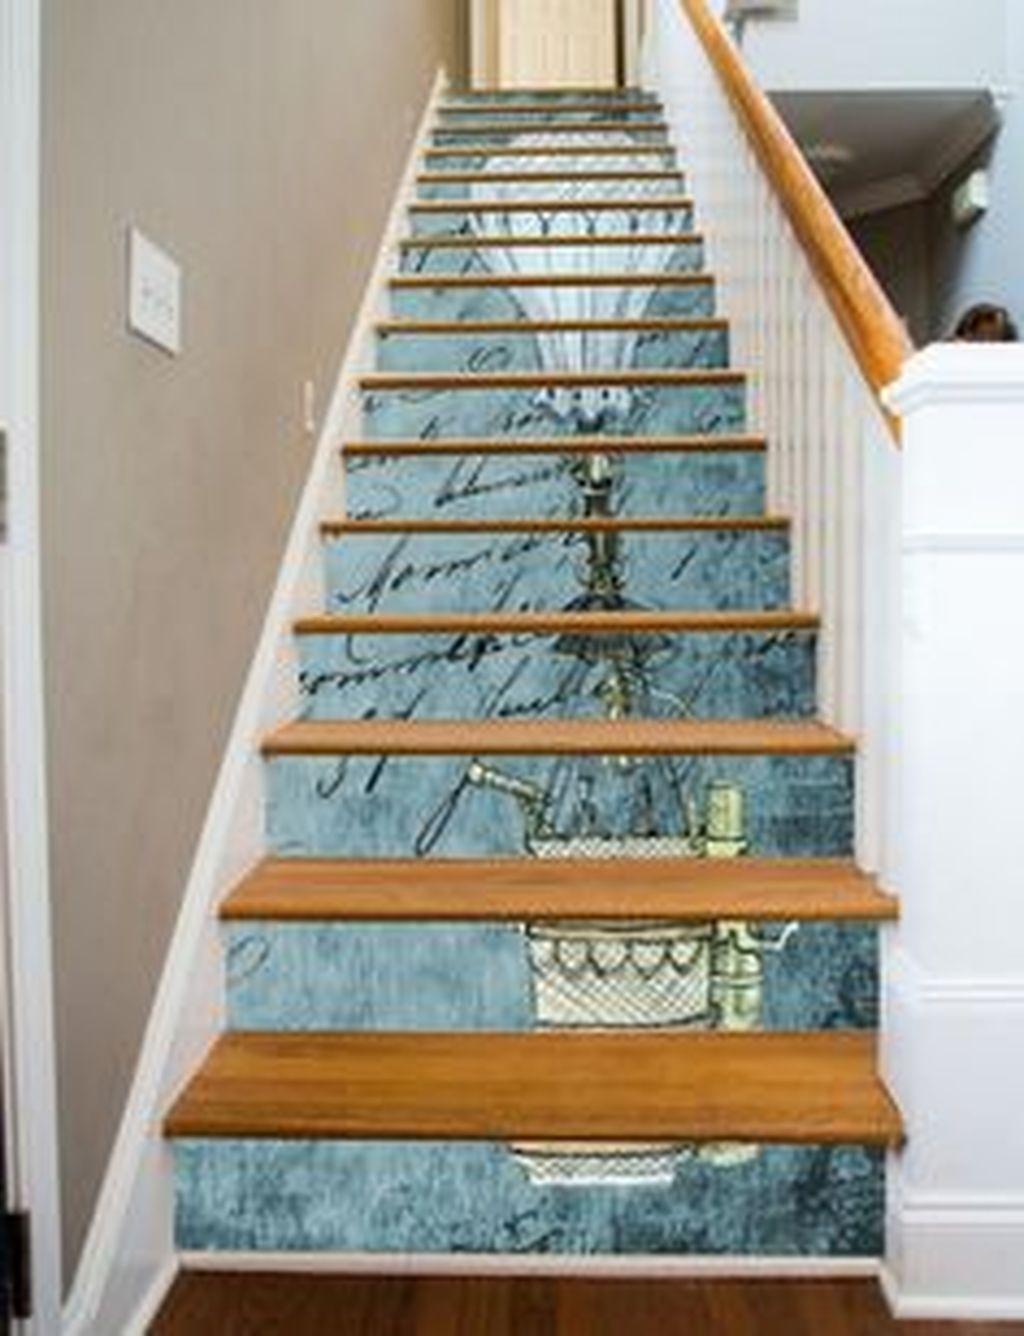 Home treppen design-ideen  totally inspiring residential staircase design ideas you can